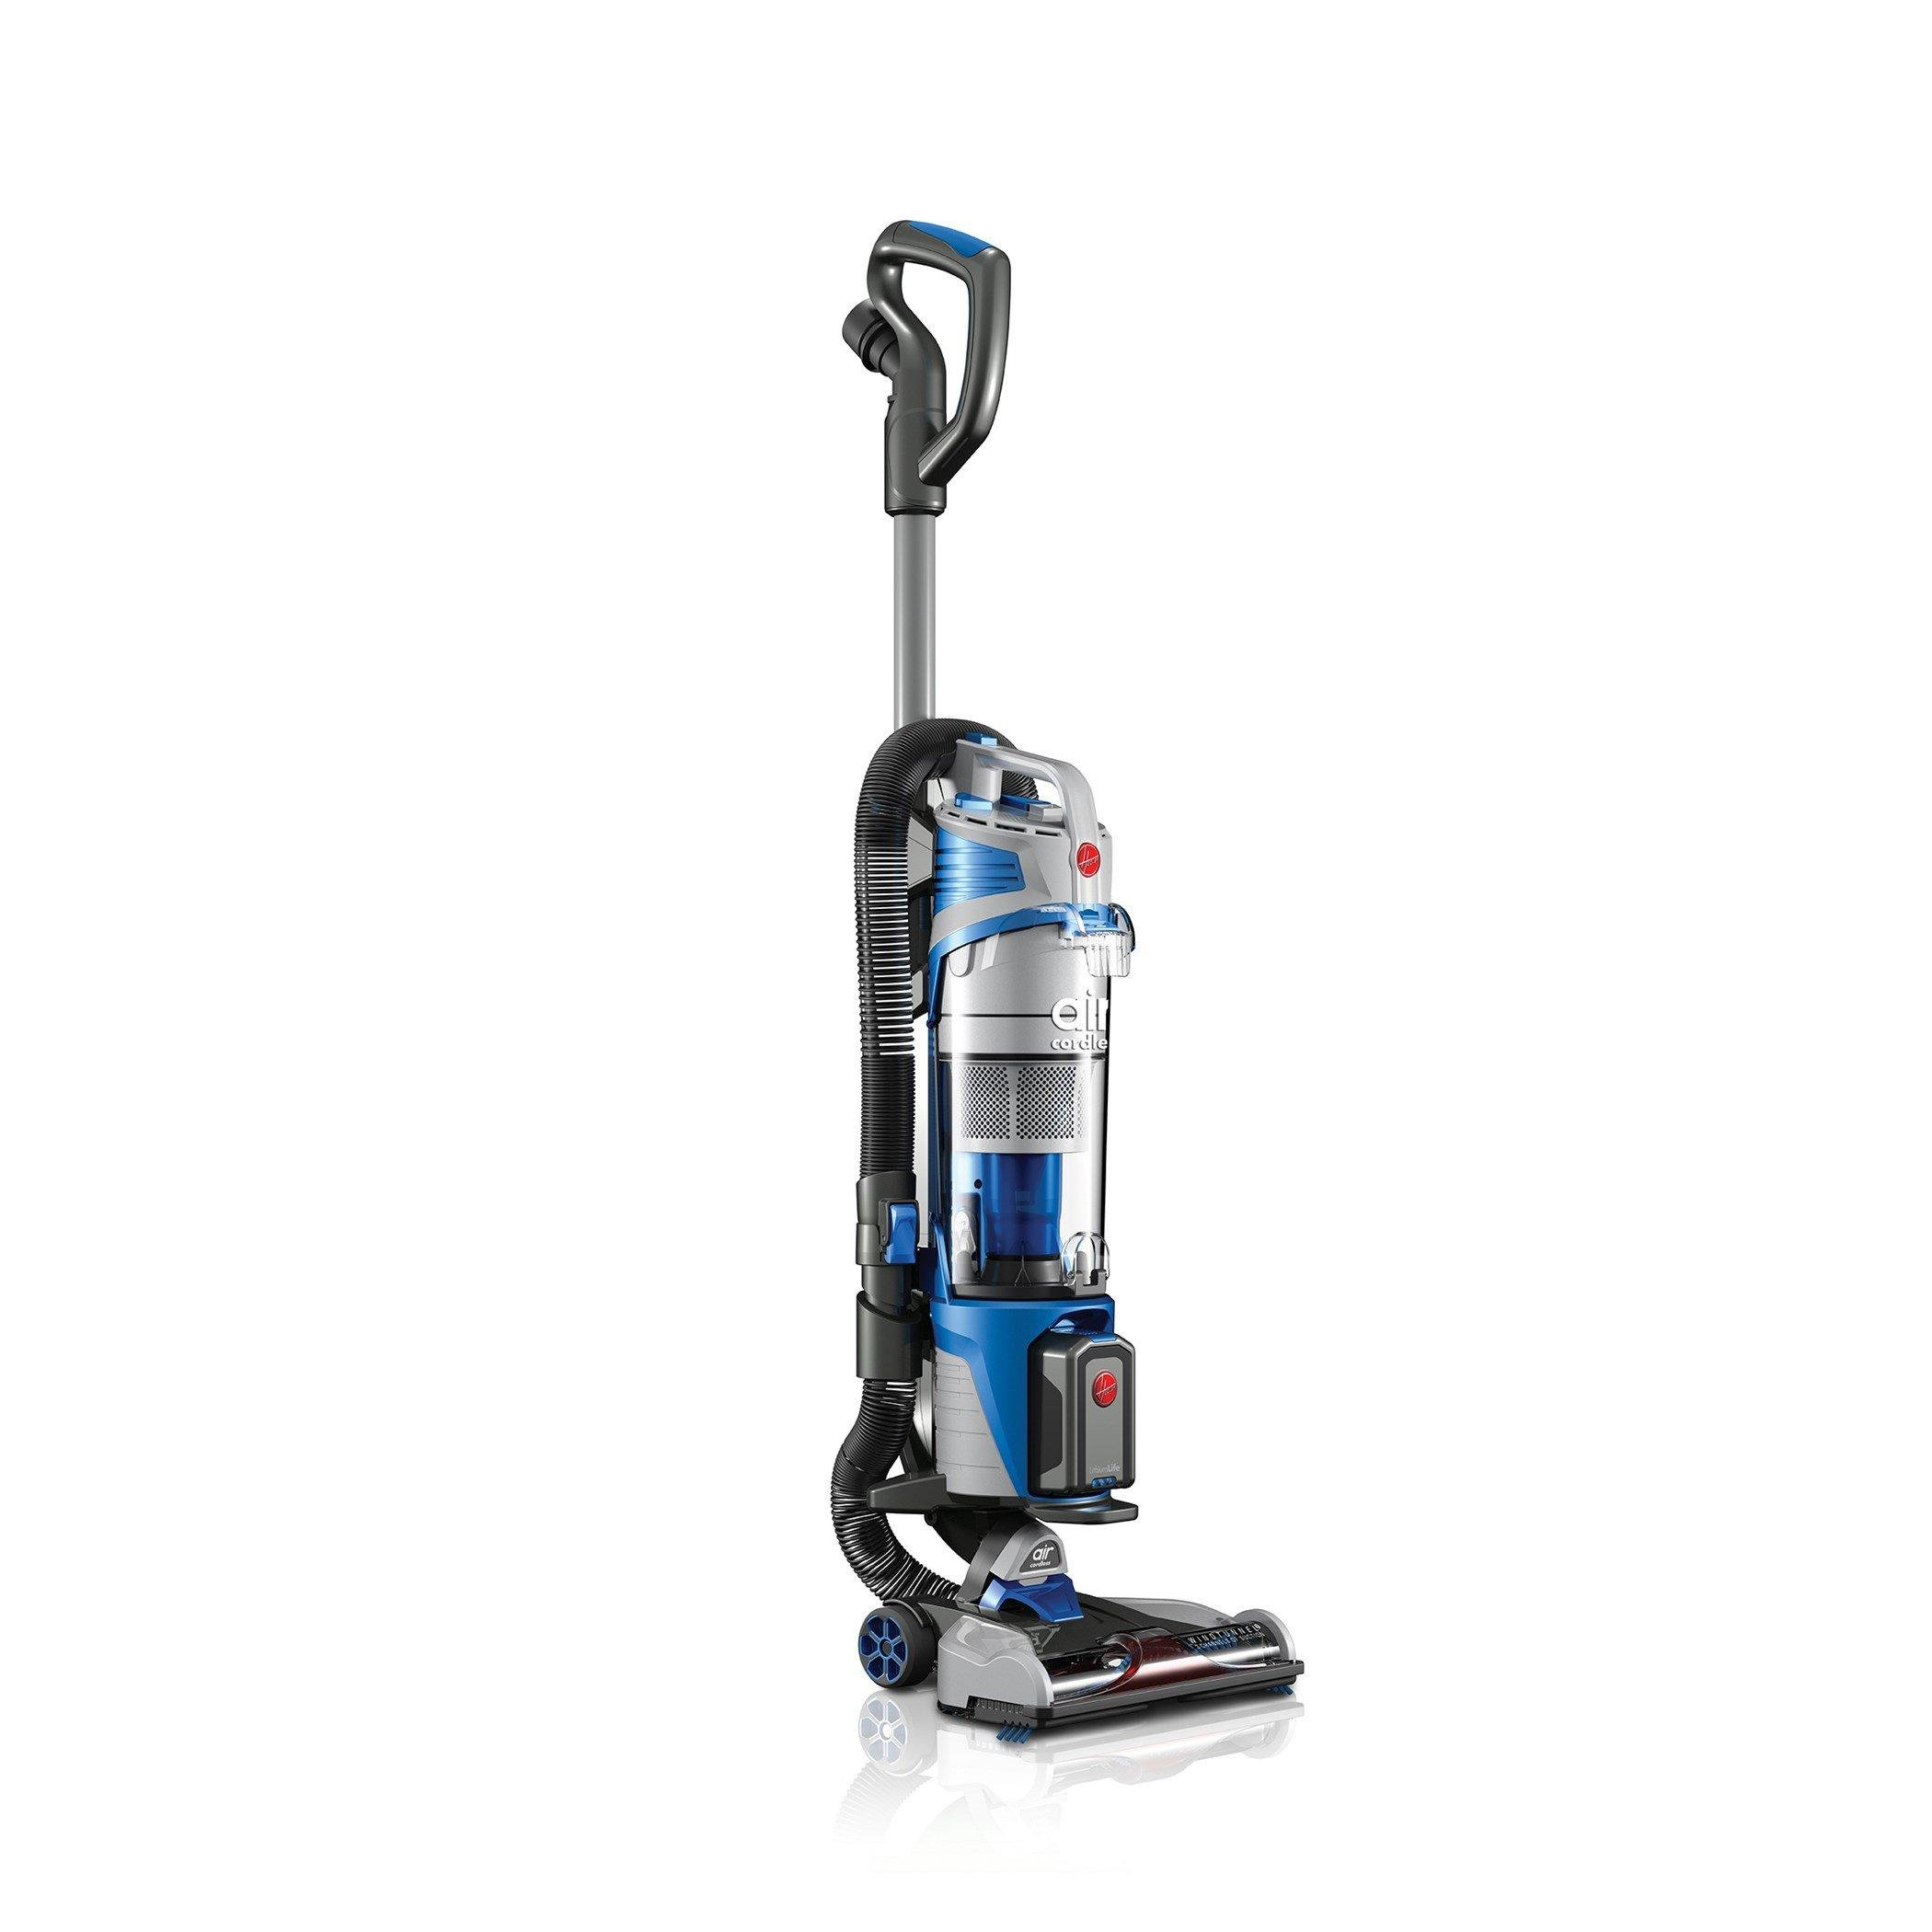 Hoover Vacuum Cleaner Air Lift 20 Volt Lithium Ion Cordless Bagless Upright Vacuum BH51120PC